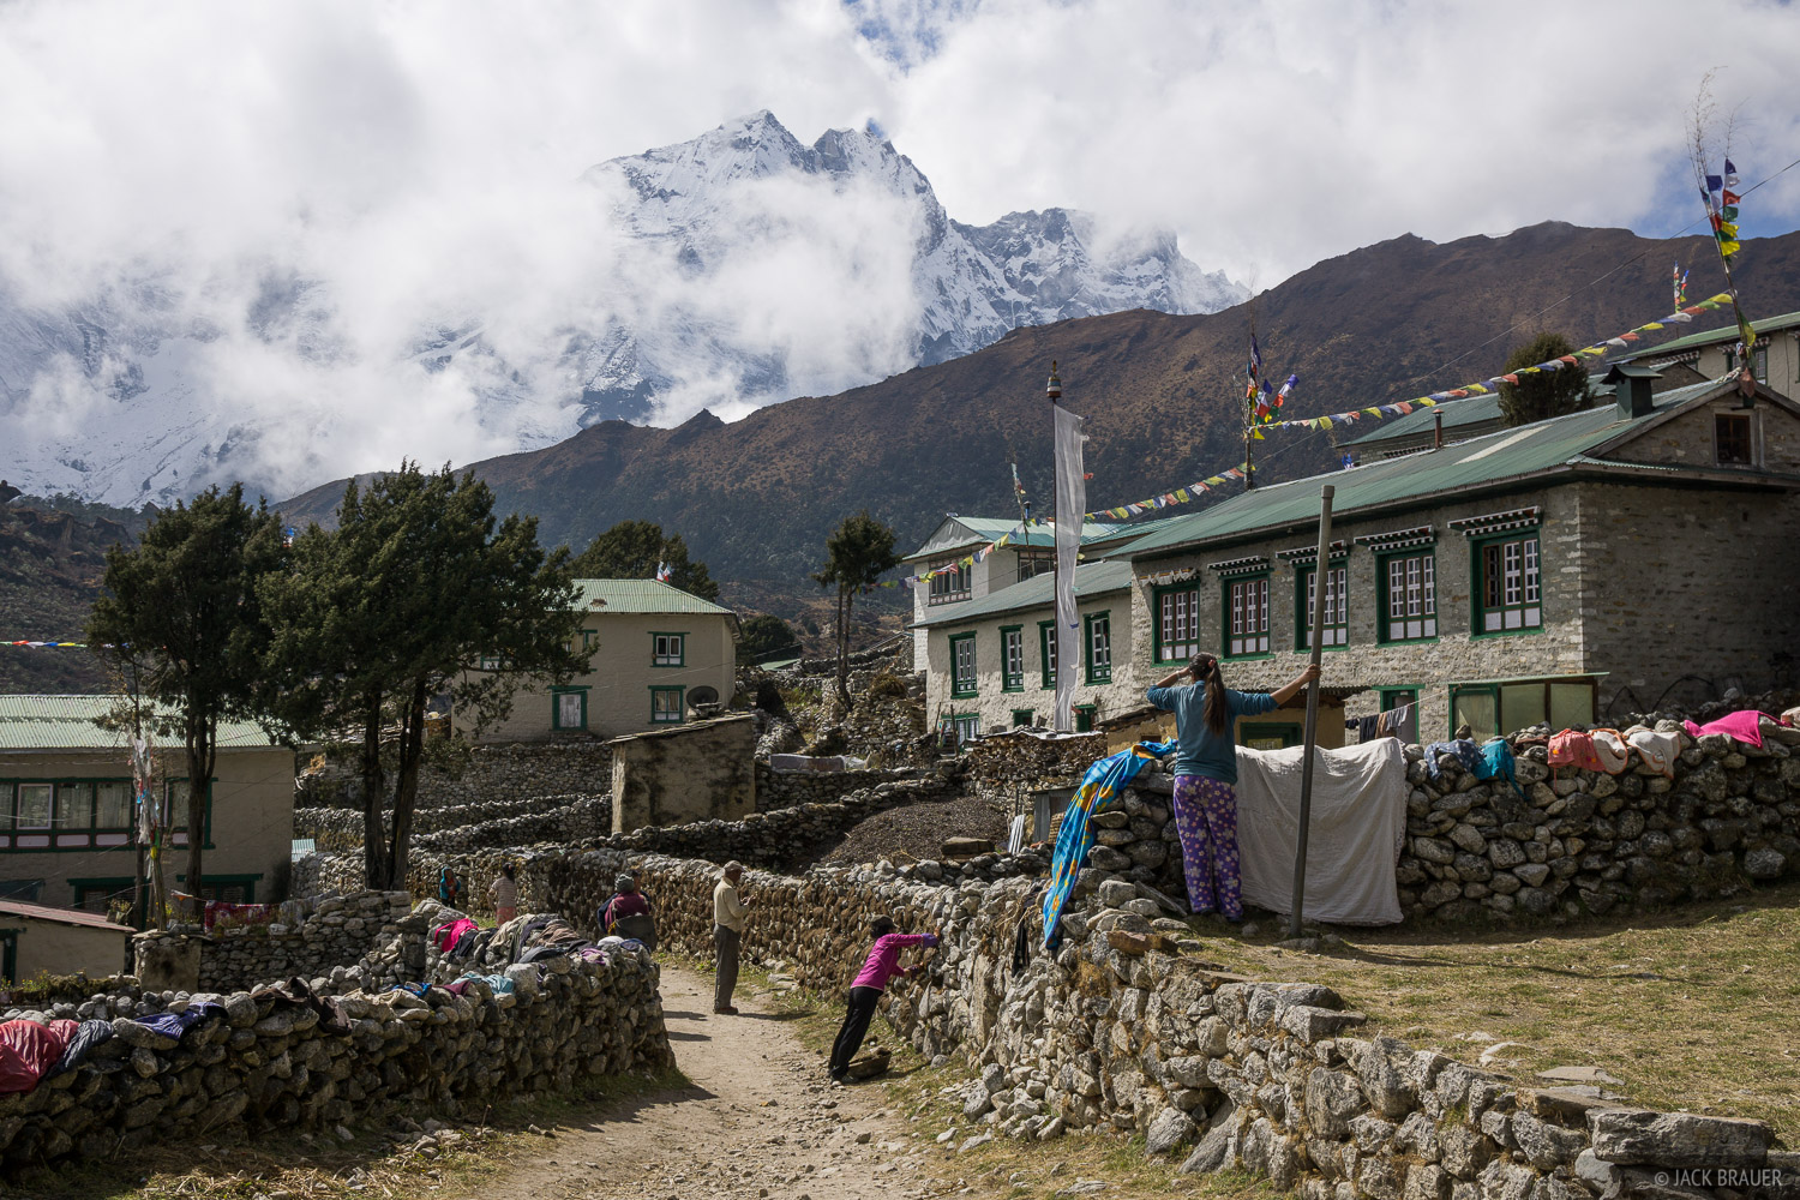 Himalaya,Khumbu,Khumjung,Nepal, photo